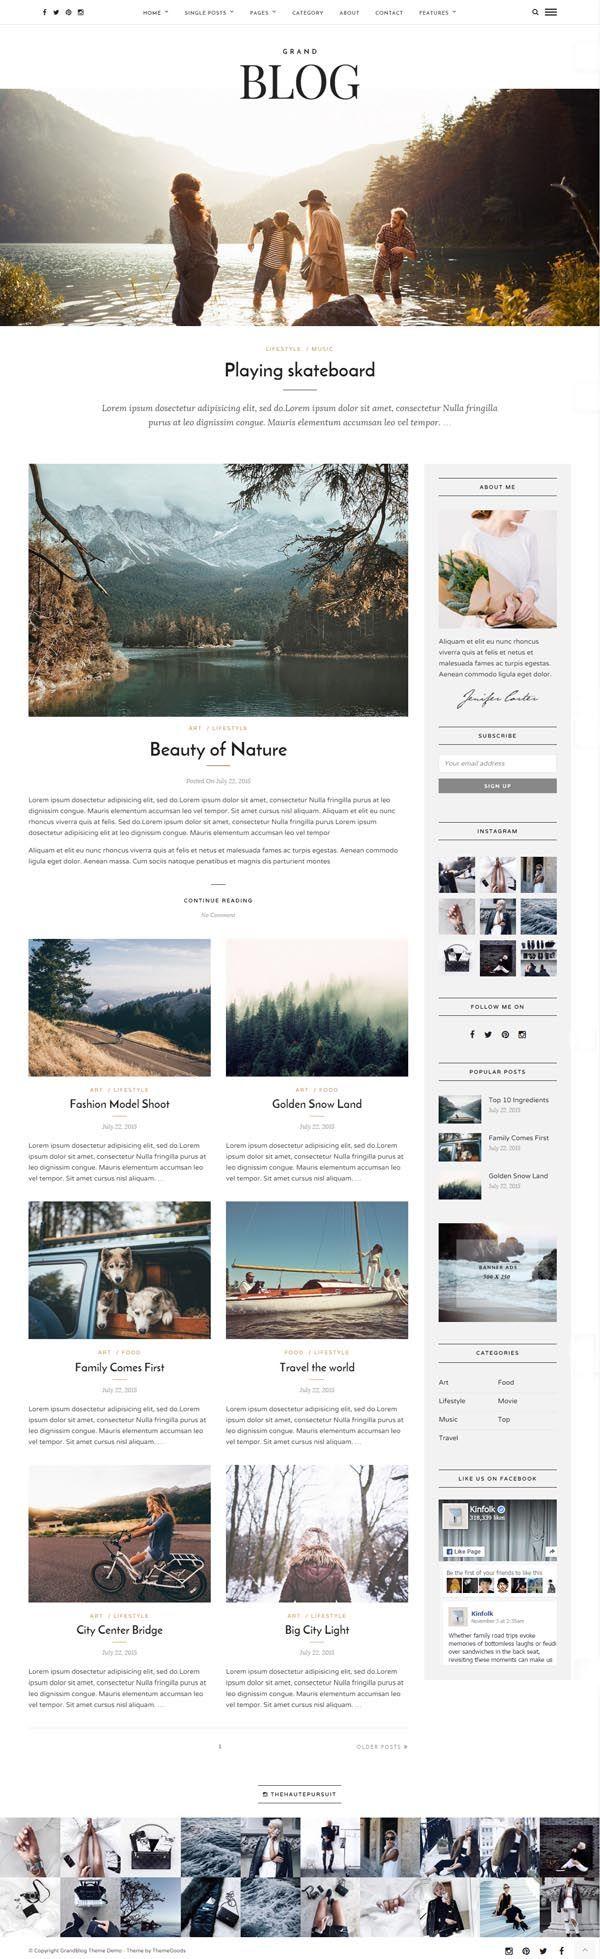 Grand Blog - Responsive Blog Theme #responsivedesign #html5 #wordpressthemes…